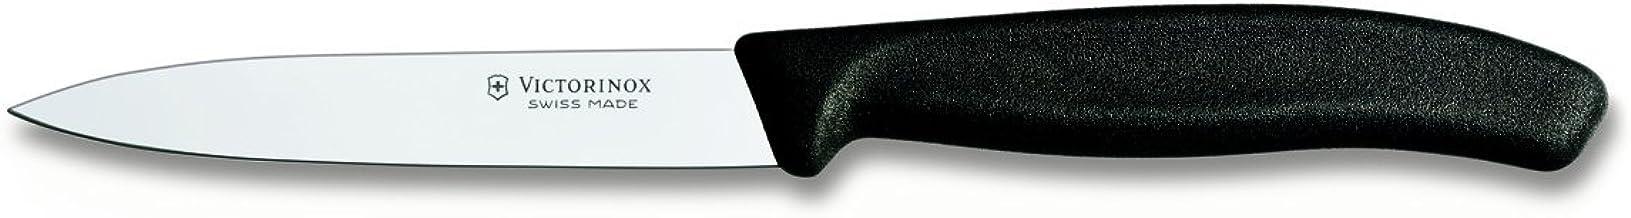 Victorinox 6.7703 Swiss Classic Paring Knife, Black